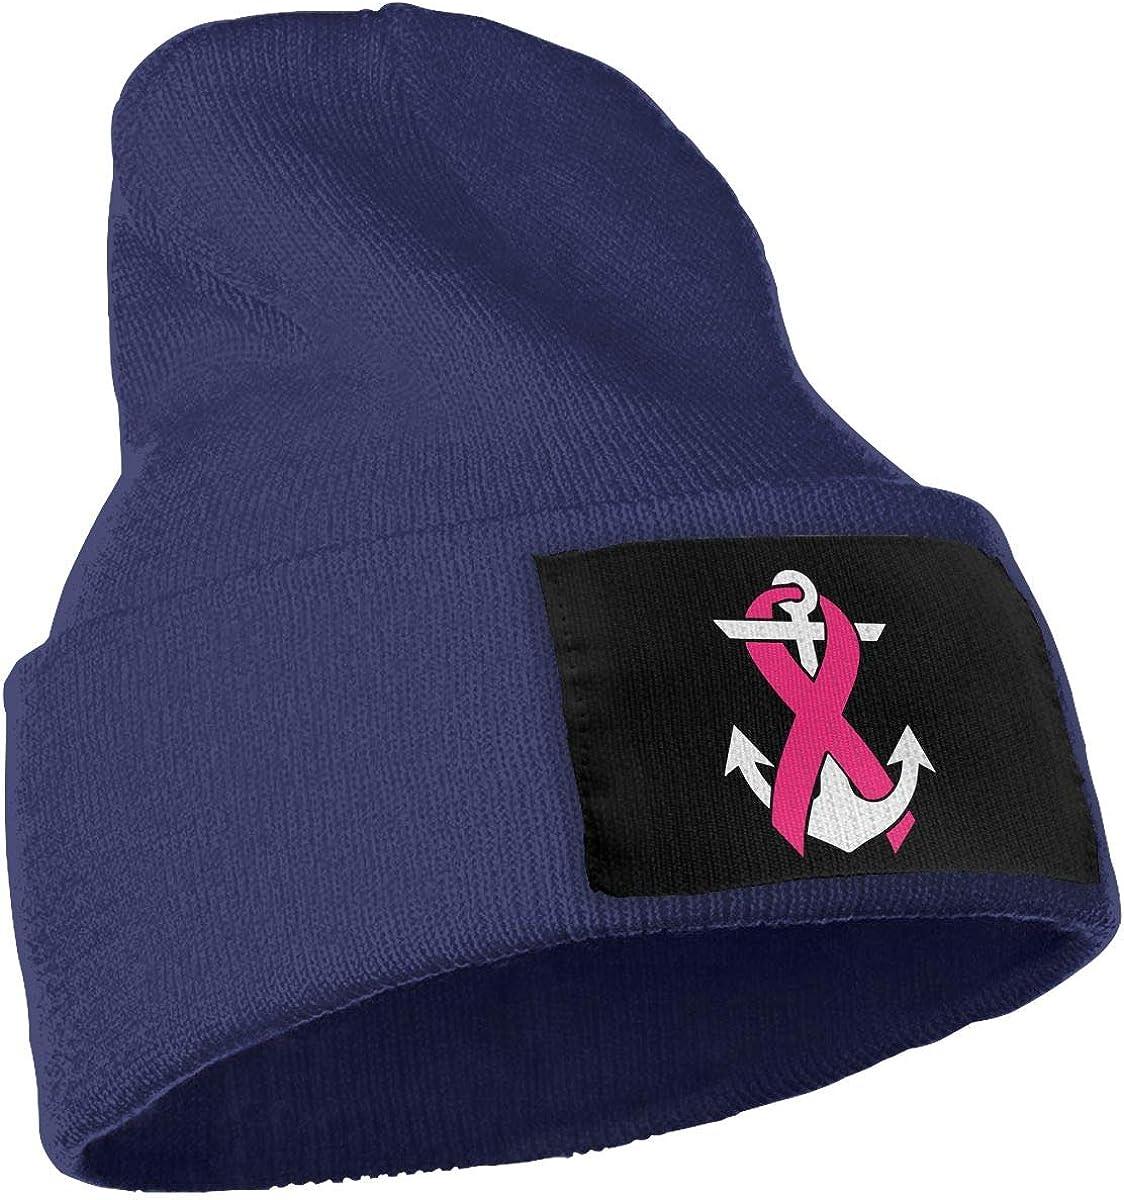 Men /& Women Breast Cancer Awareness Anchor Outdoor Warm Knit Beanies Hat Soft Winter Skull Caps